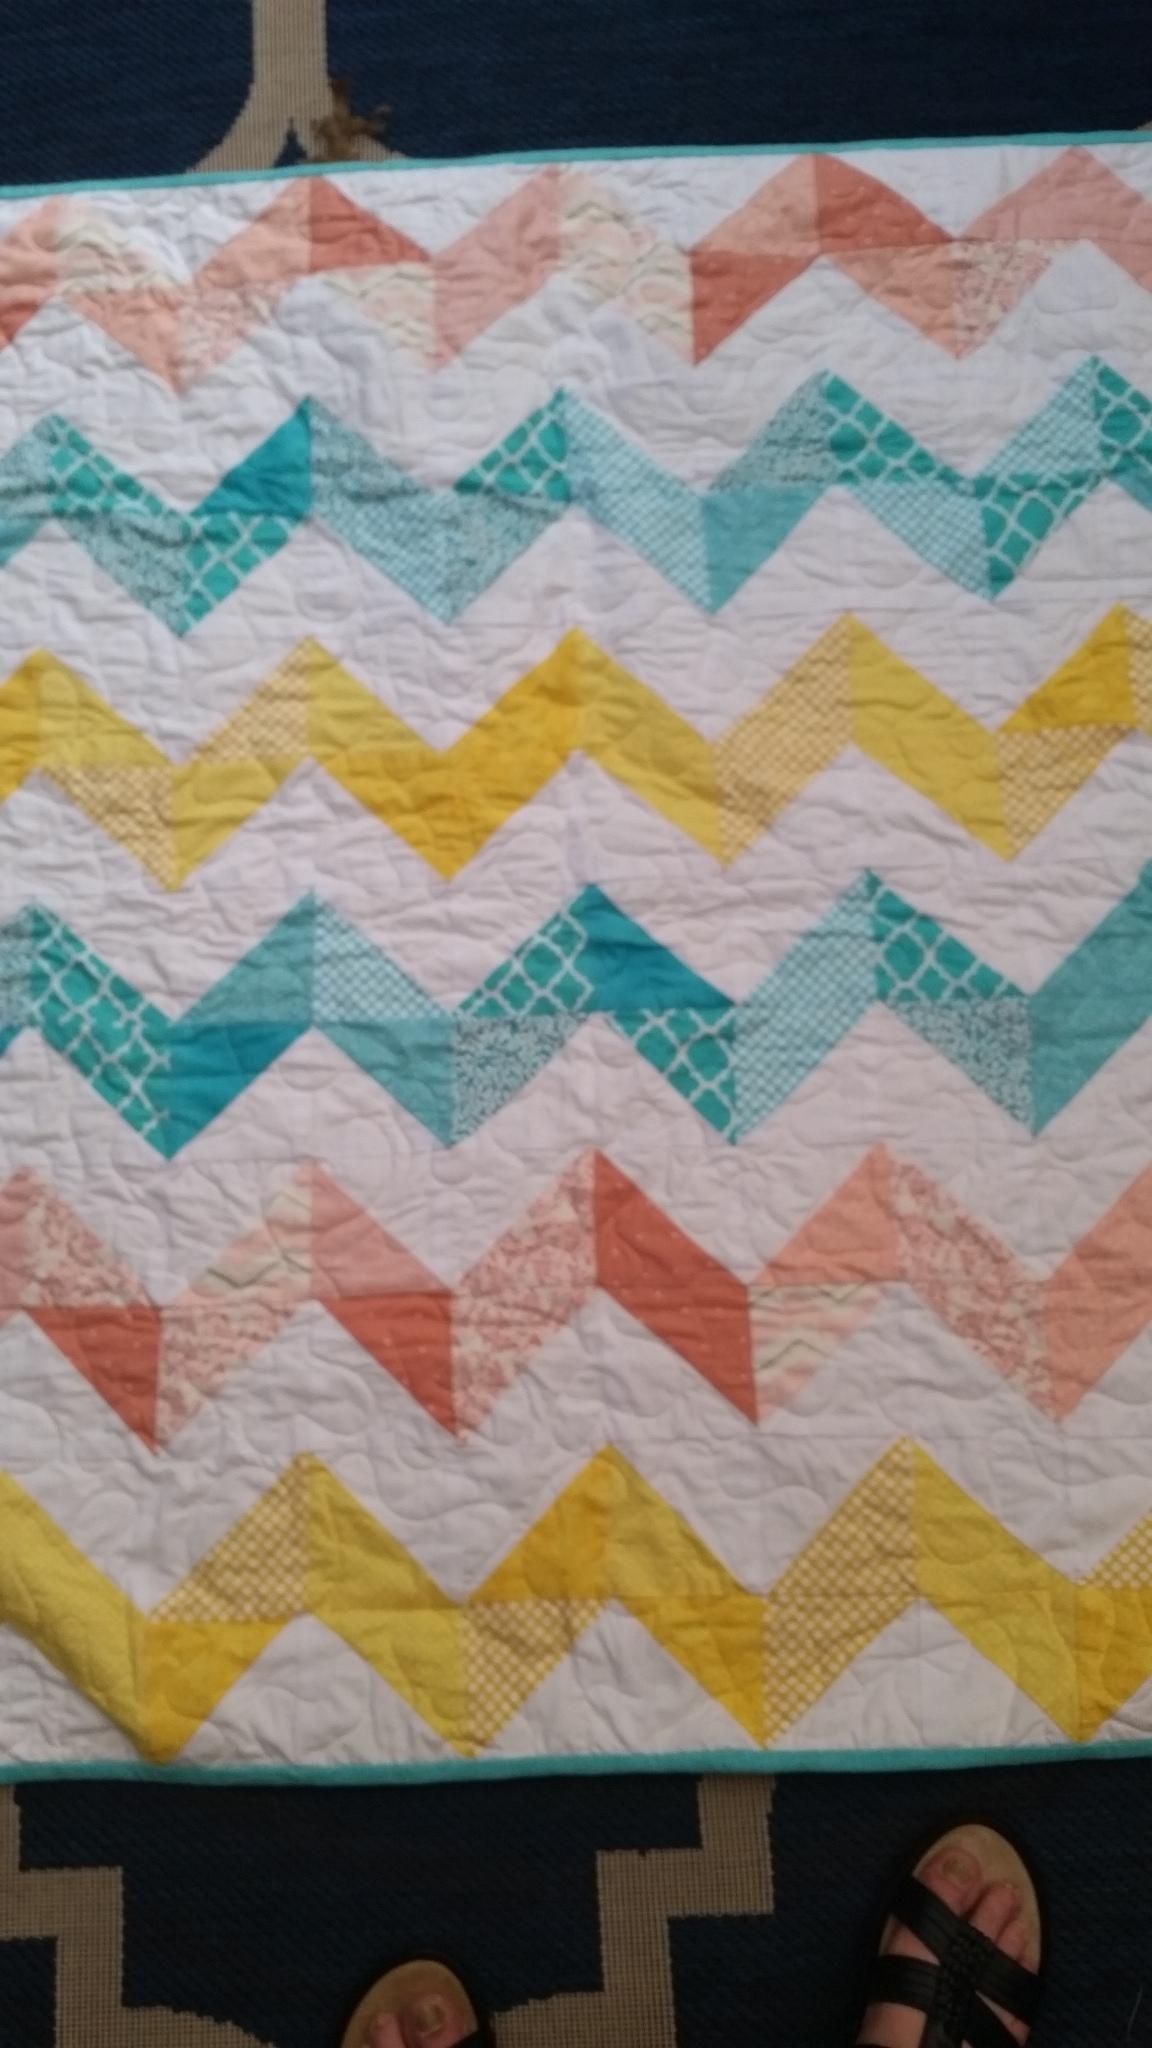 Chevron Crib Quilt, Zig Zag Crib Quilt, Gender Neutral Crib Quilt, Coral, Teal, Yellow, Pieced Quilt, Handmade Quilt, Homemade Quilt, Girl Crib Bedding, Boy Crib Bedding